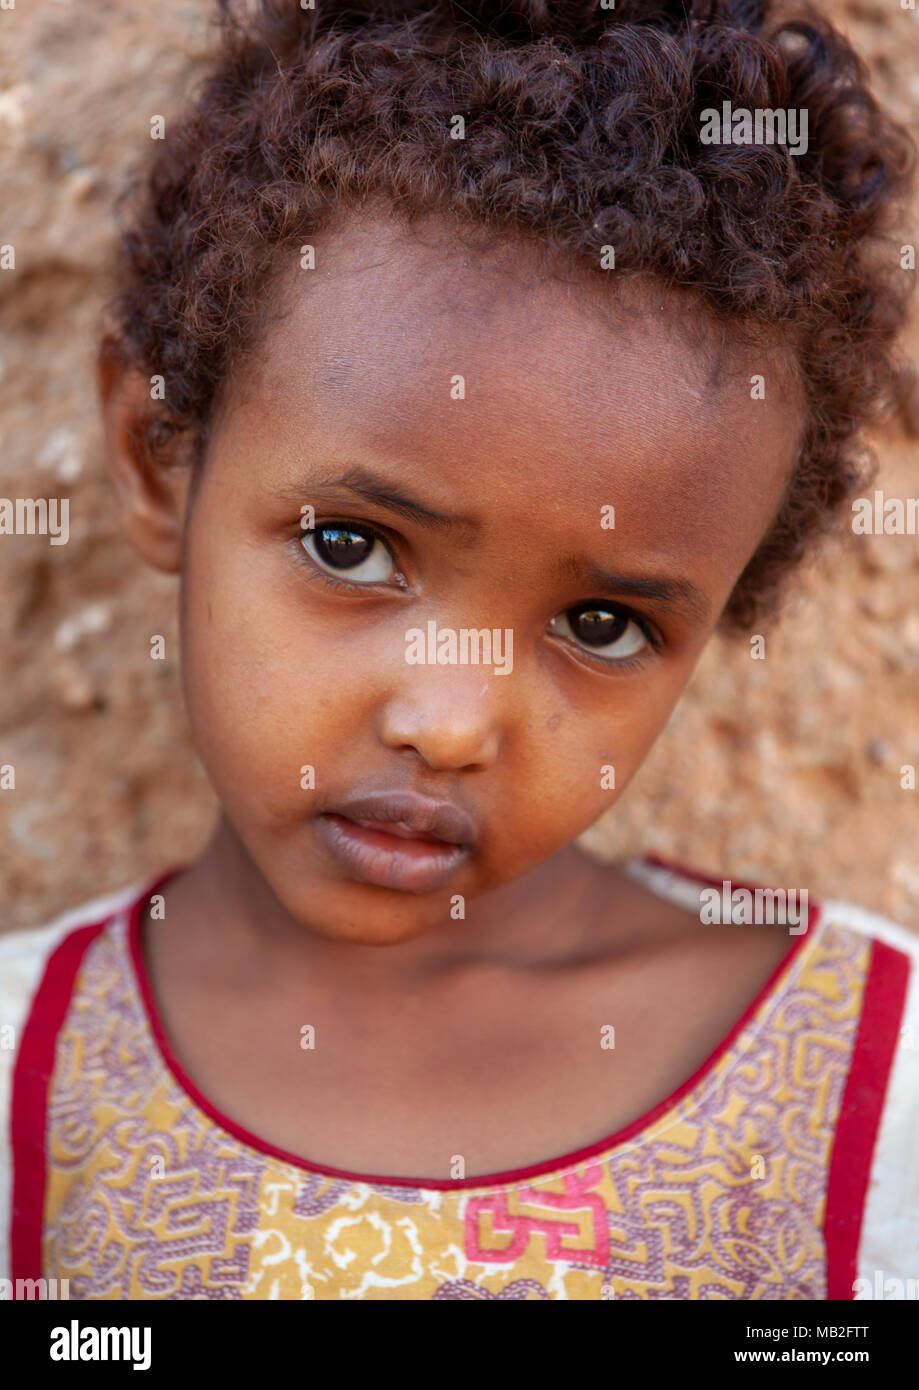 Prnography in somali girls